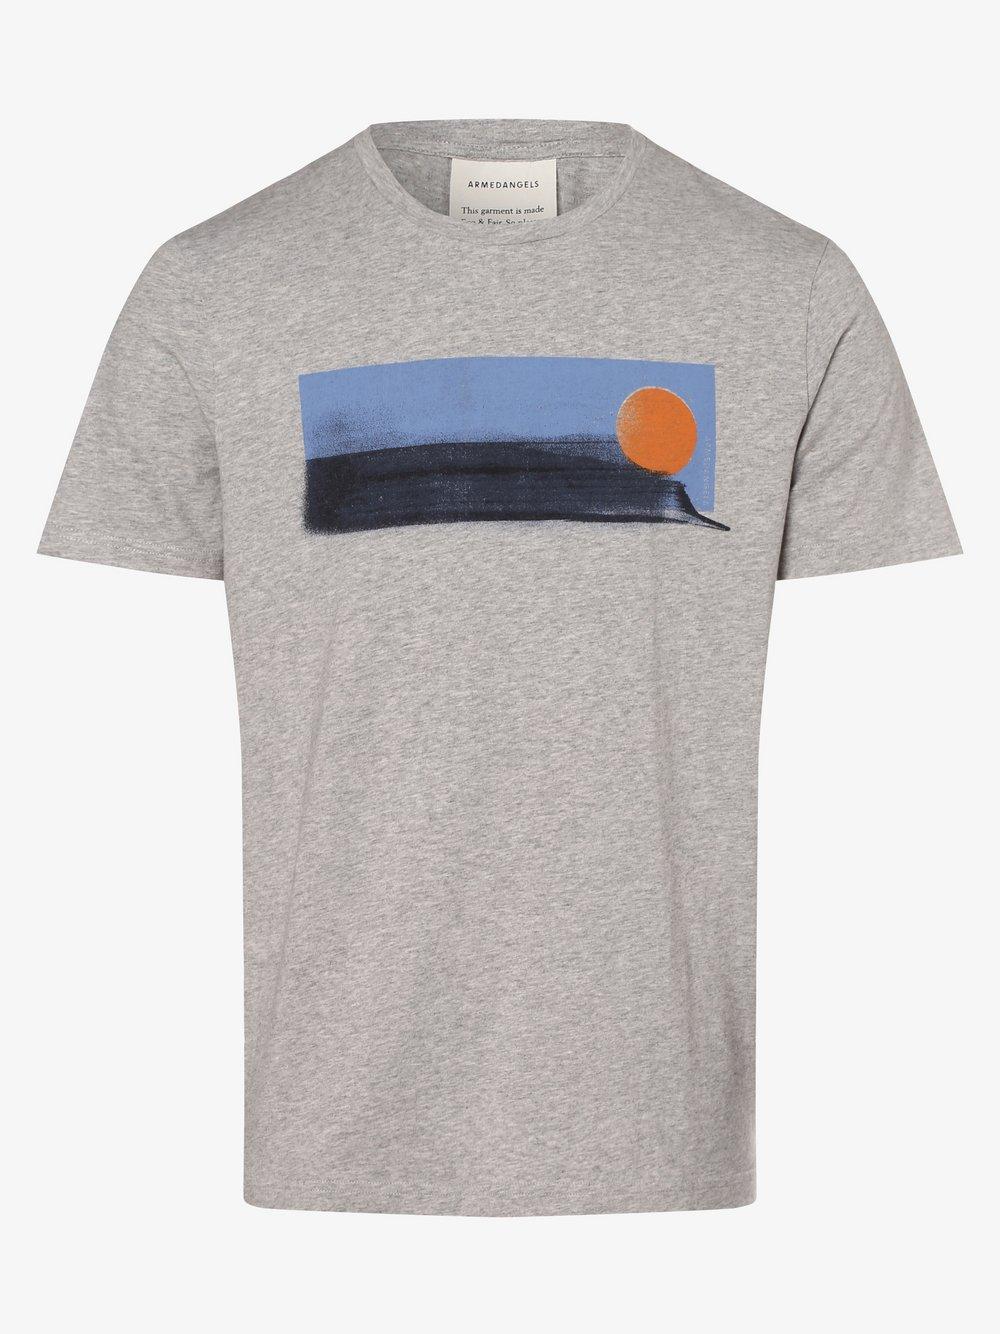 ARMEDANGELS - T-shirt męski – Jaames, szary